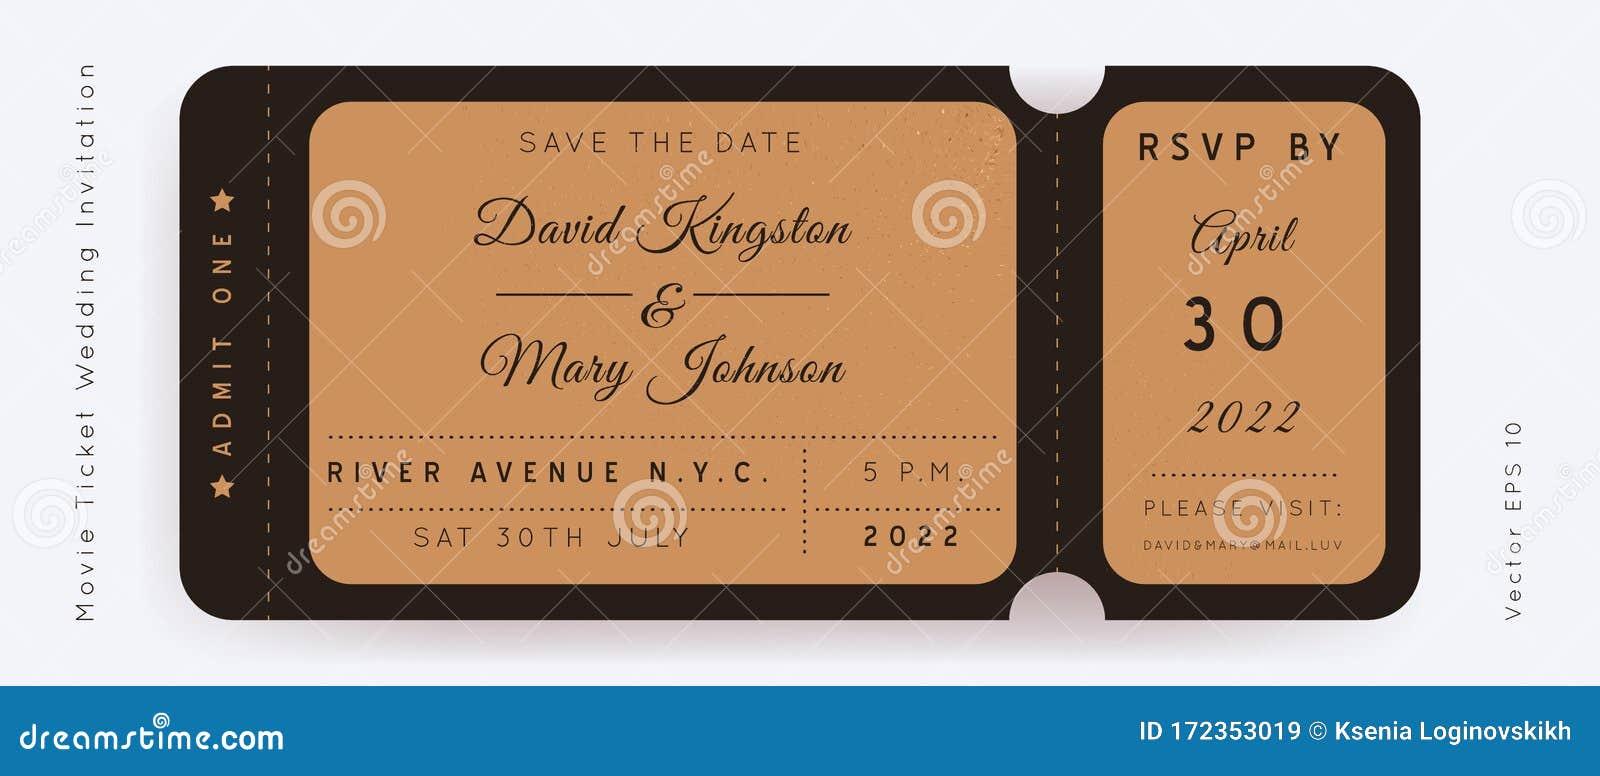 Movie Wedding Ticket Vector Stock Vector   Illustration of date ...